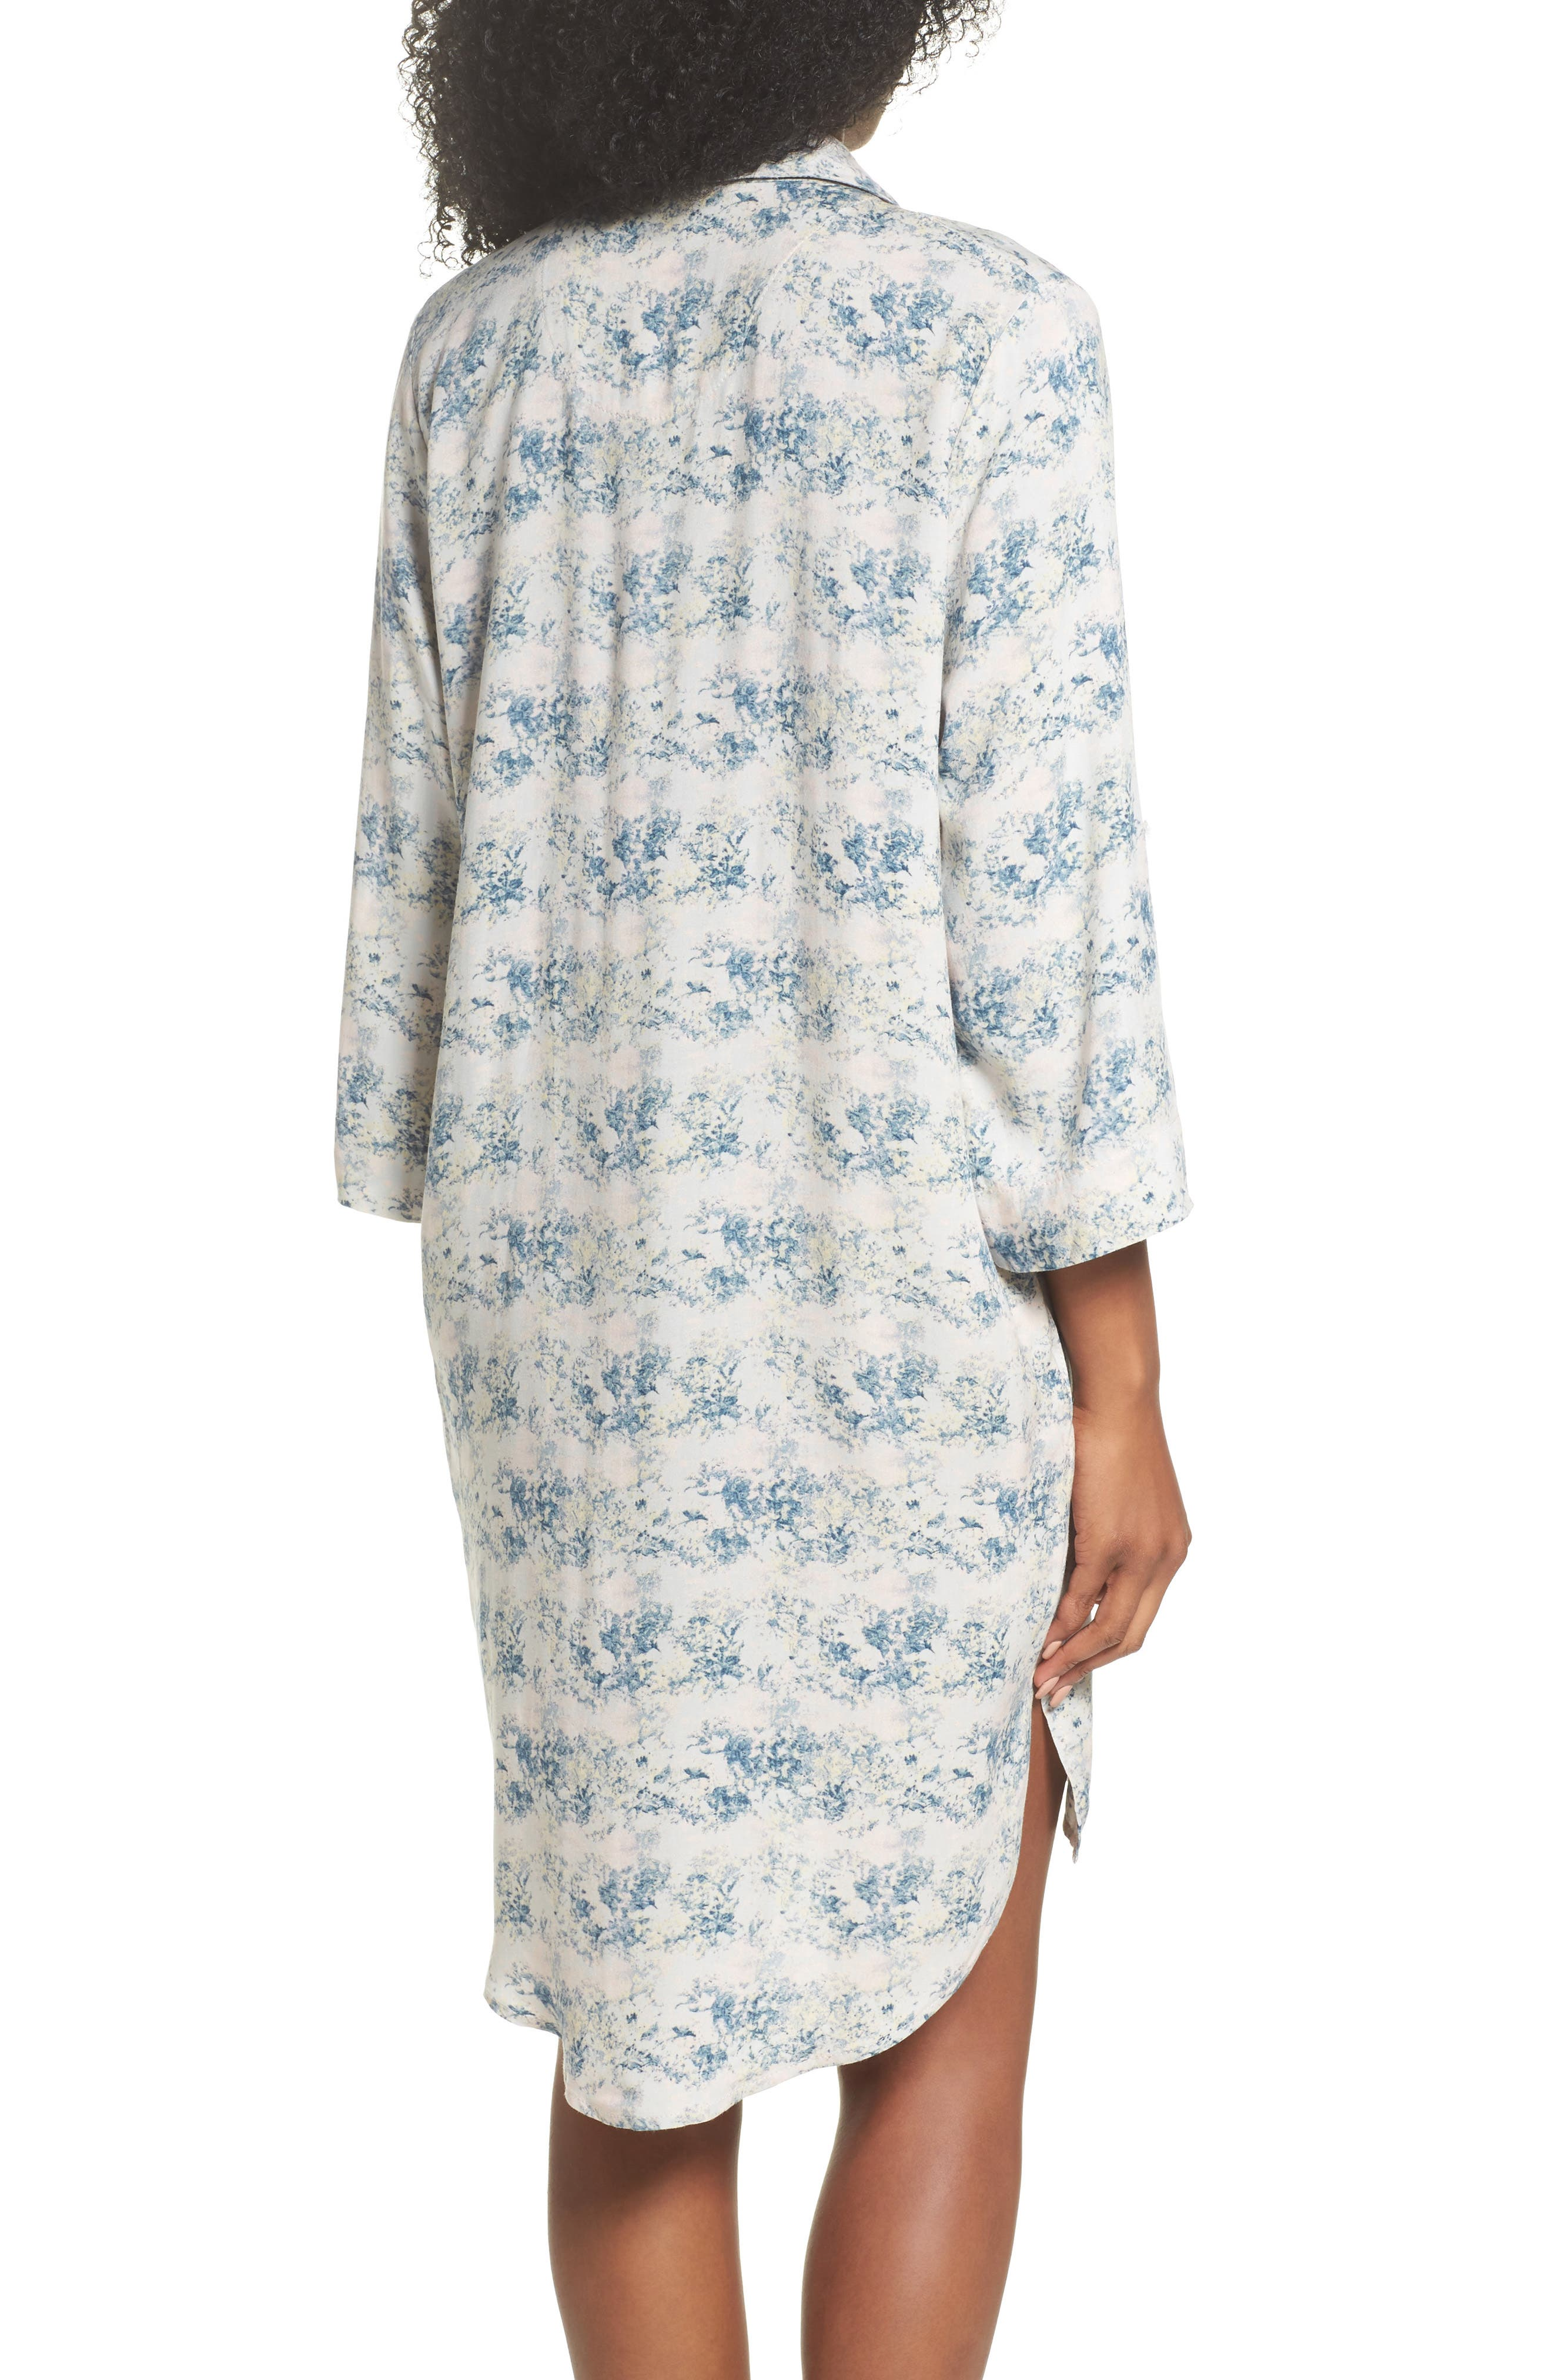 Floral Print Sleep Shirt,                             Alternate thumbnail 2, color,                             403